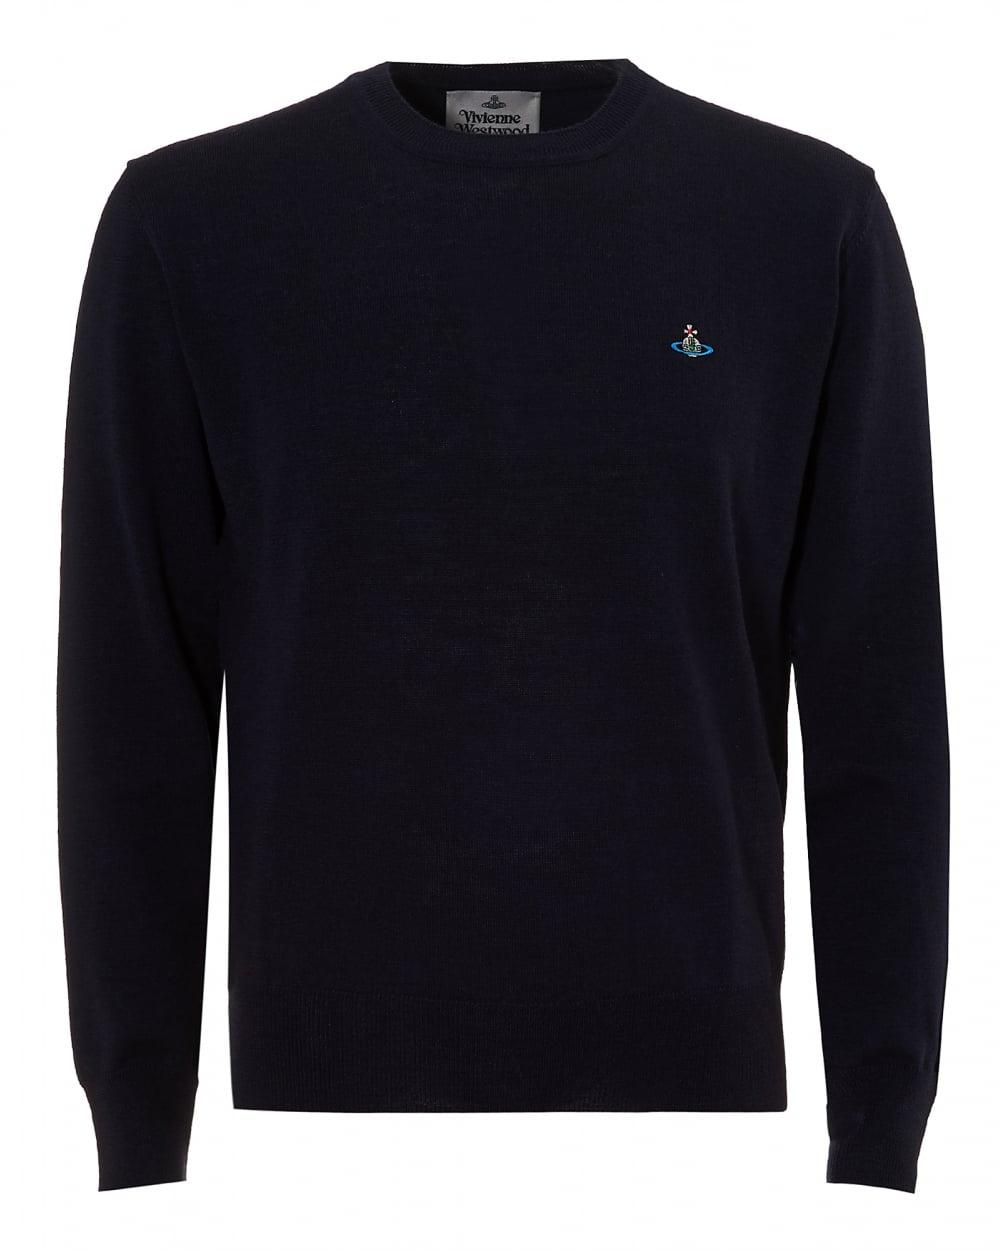 Mens Navy Blue Slim-Fit Wool Orb Logo Jumper